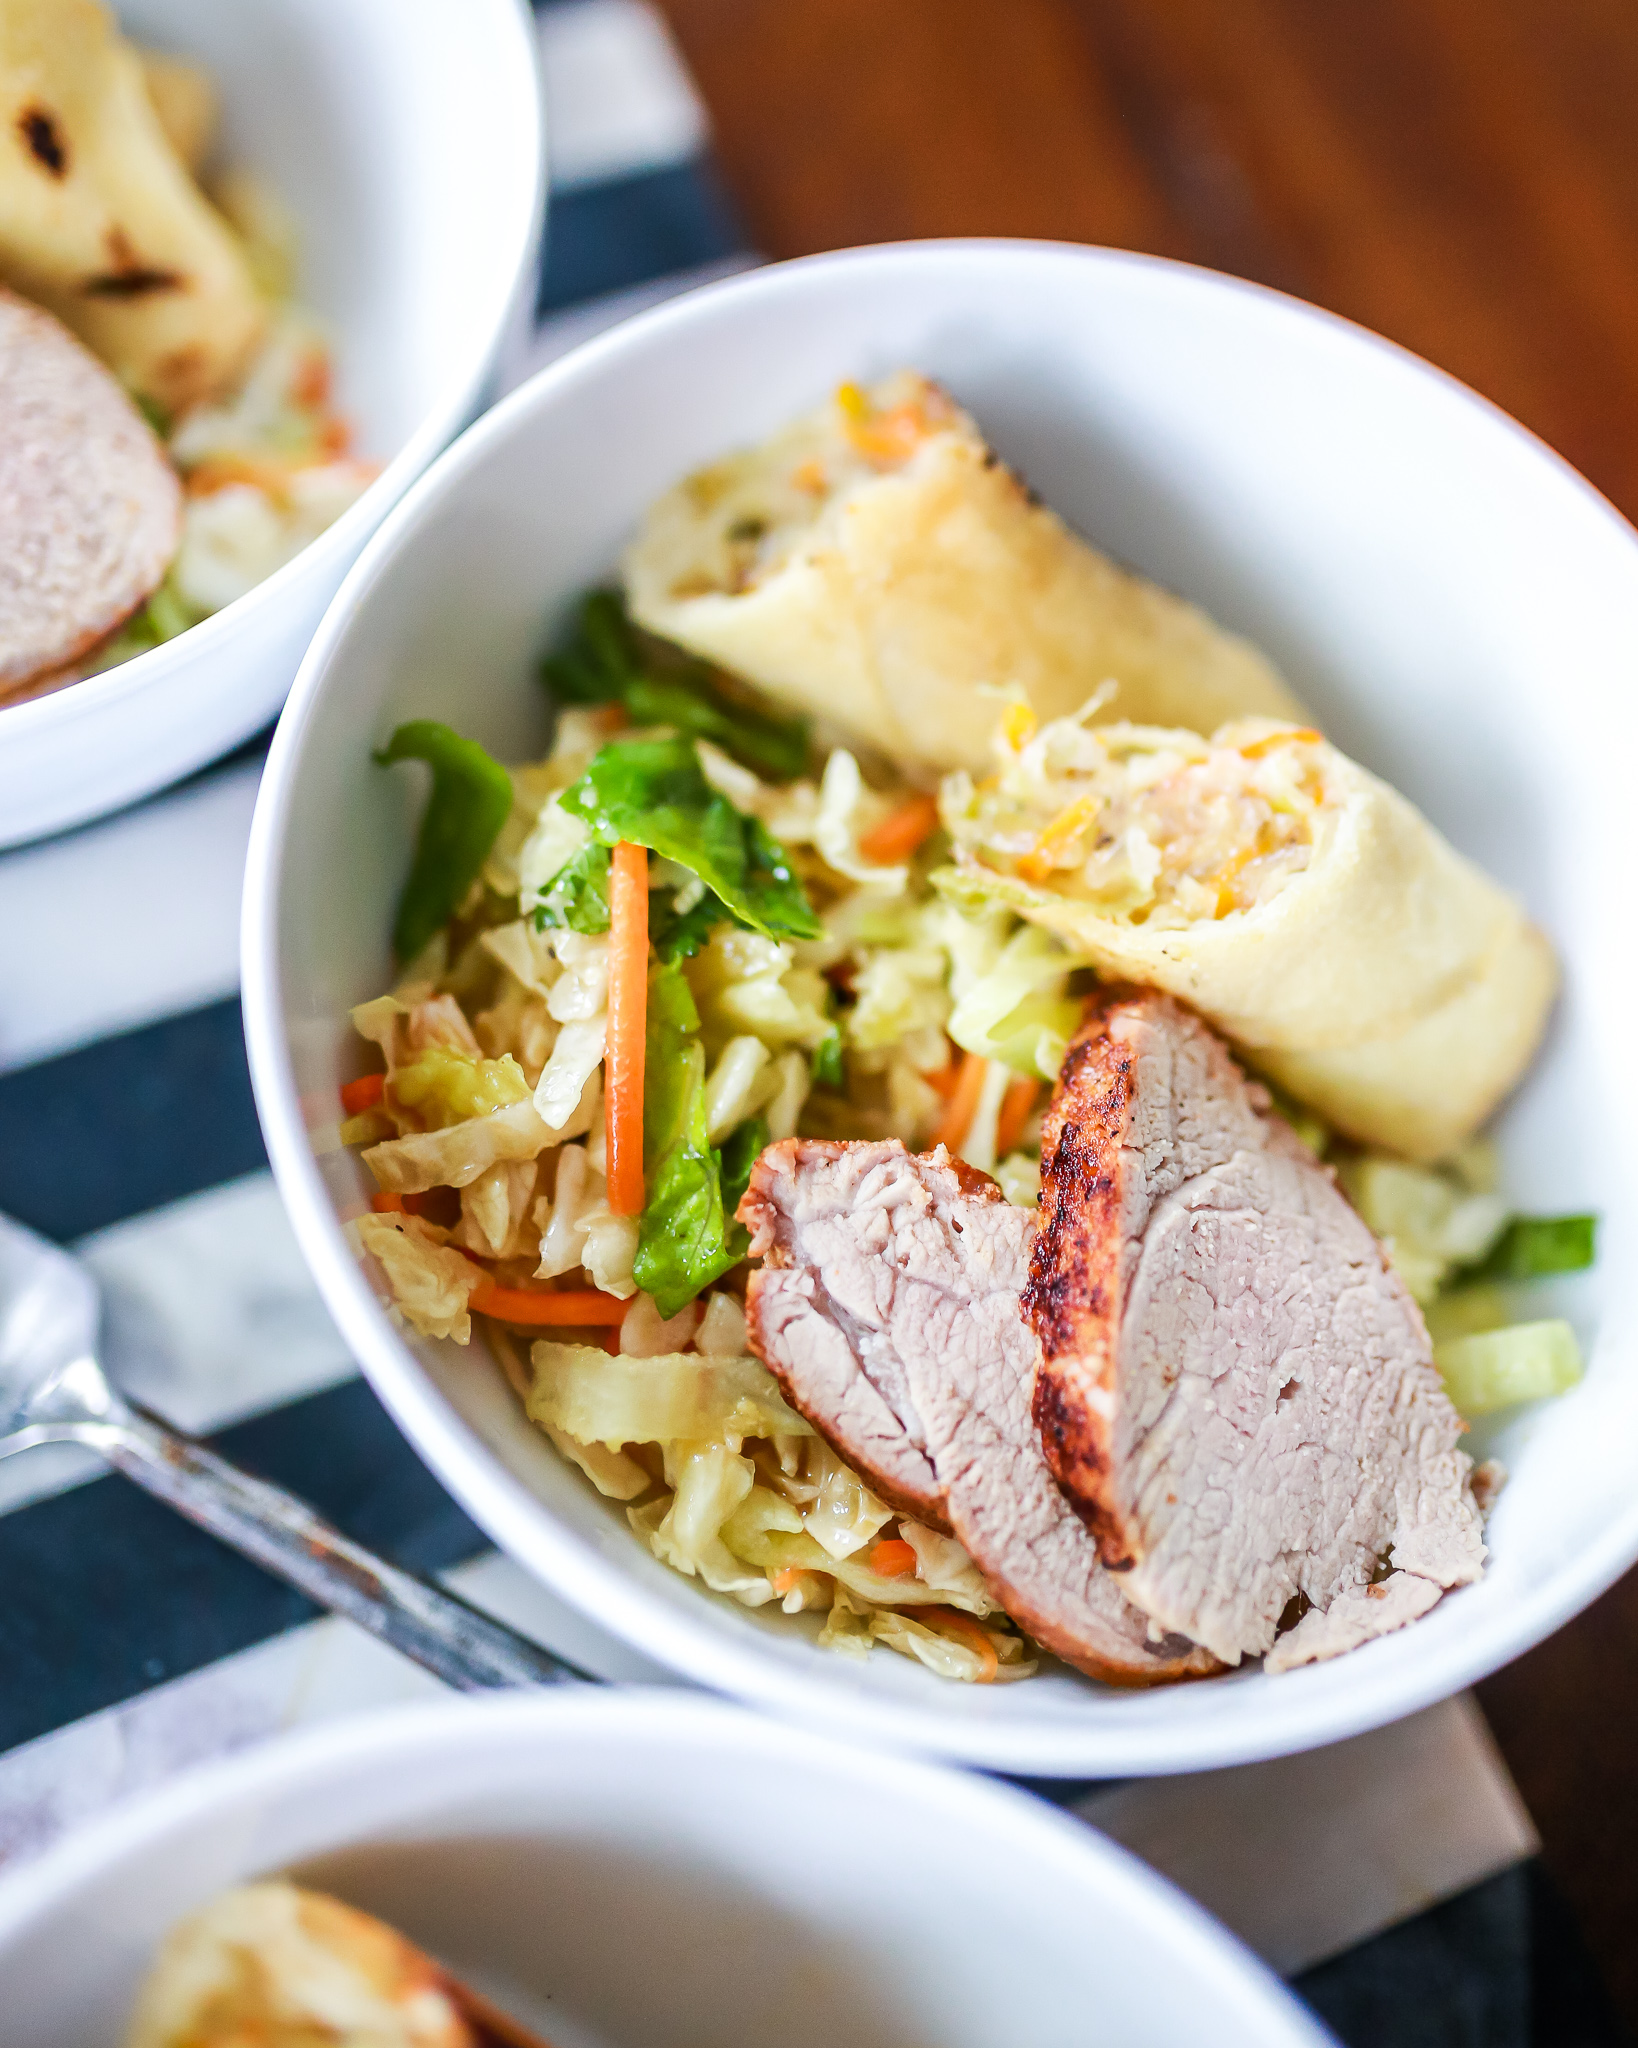 Lemon Rosemary roasted pork tenderloin with asian salad